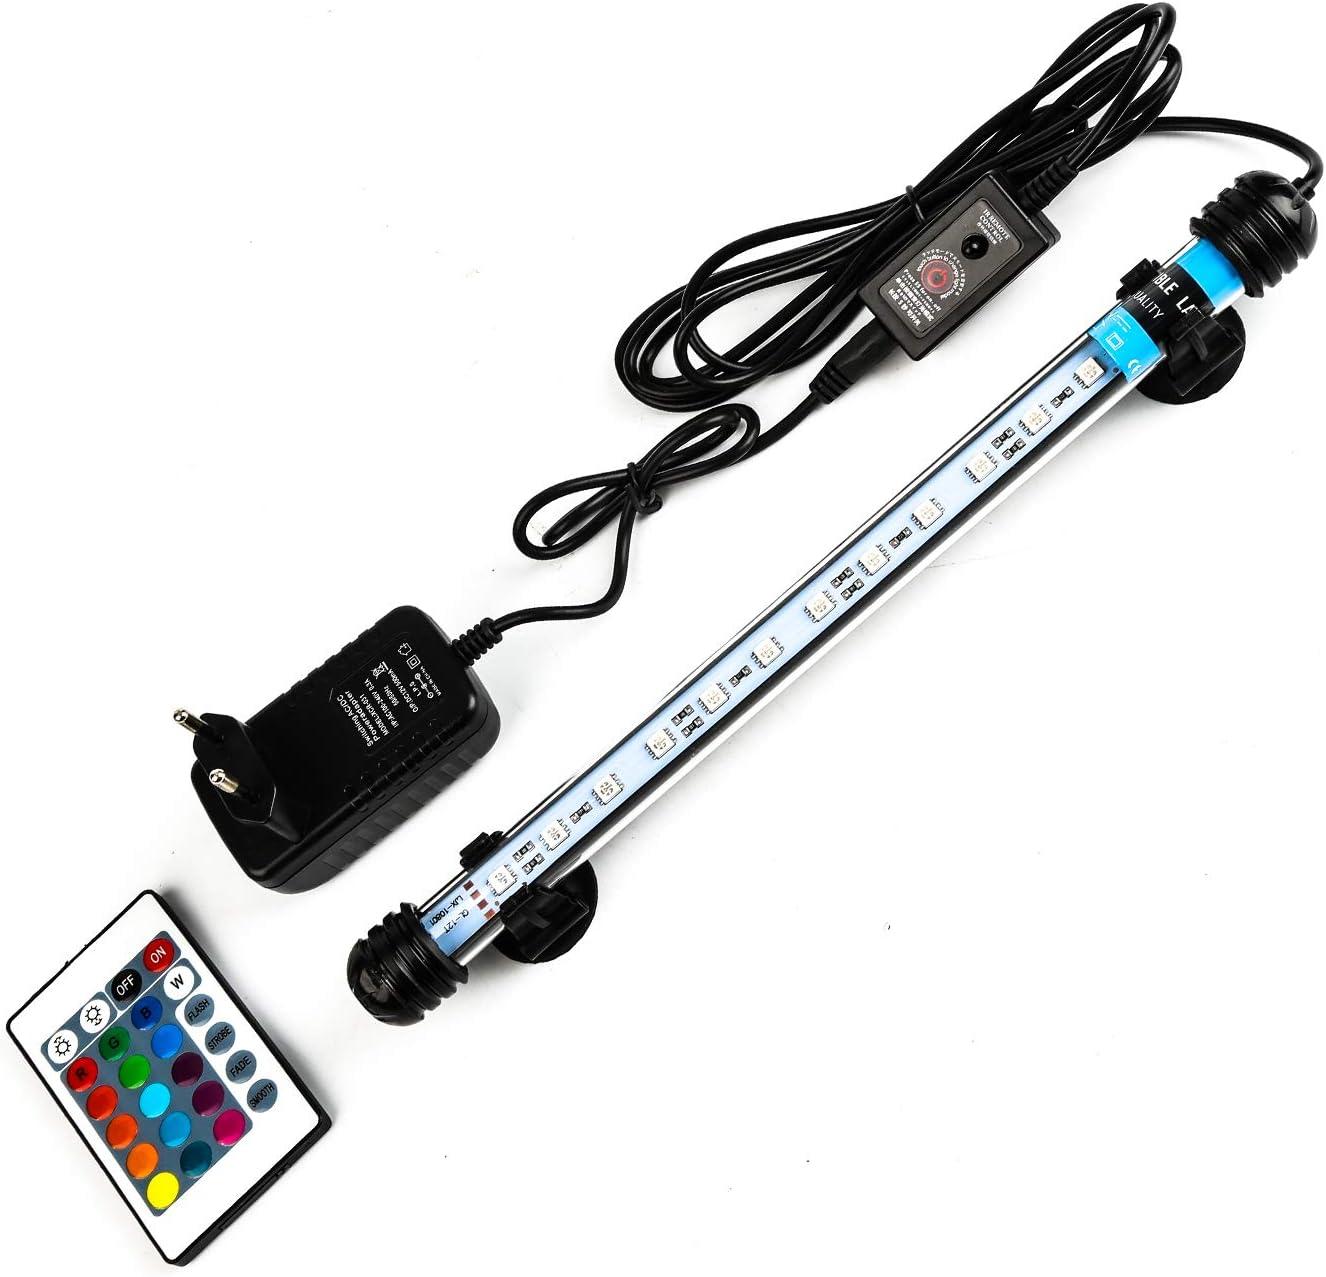 Lueigmo LED Acquario, 18cm RGB LED Aquarium Lighting, Luce Acquario a Tubo Impermeabile e Sommergibile,1,5W